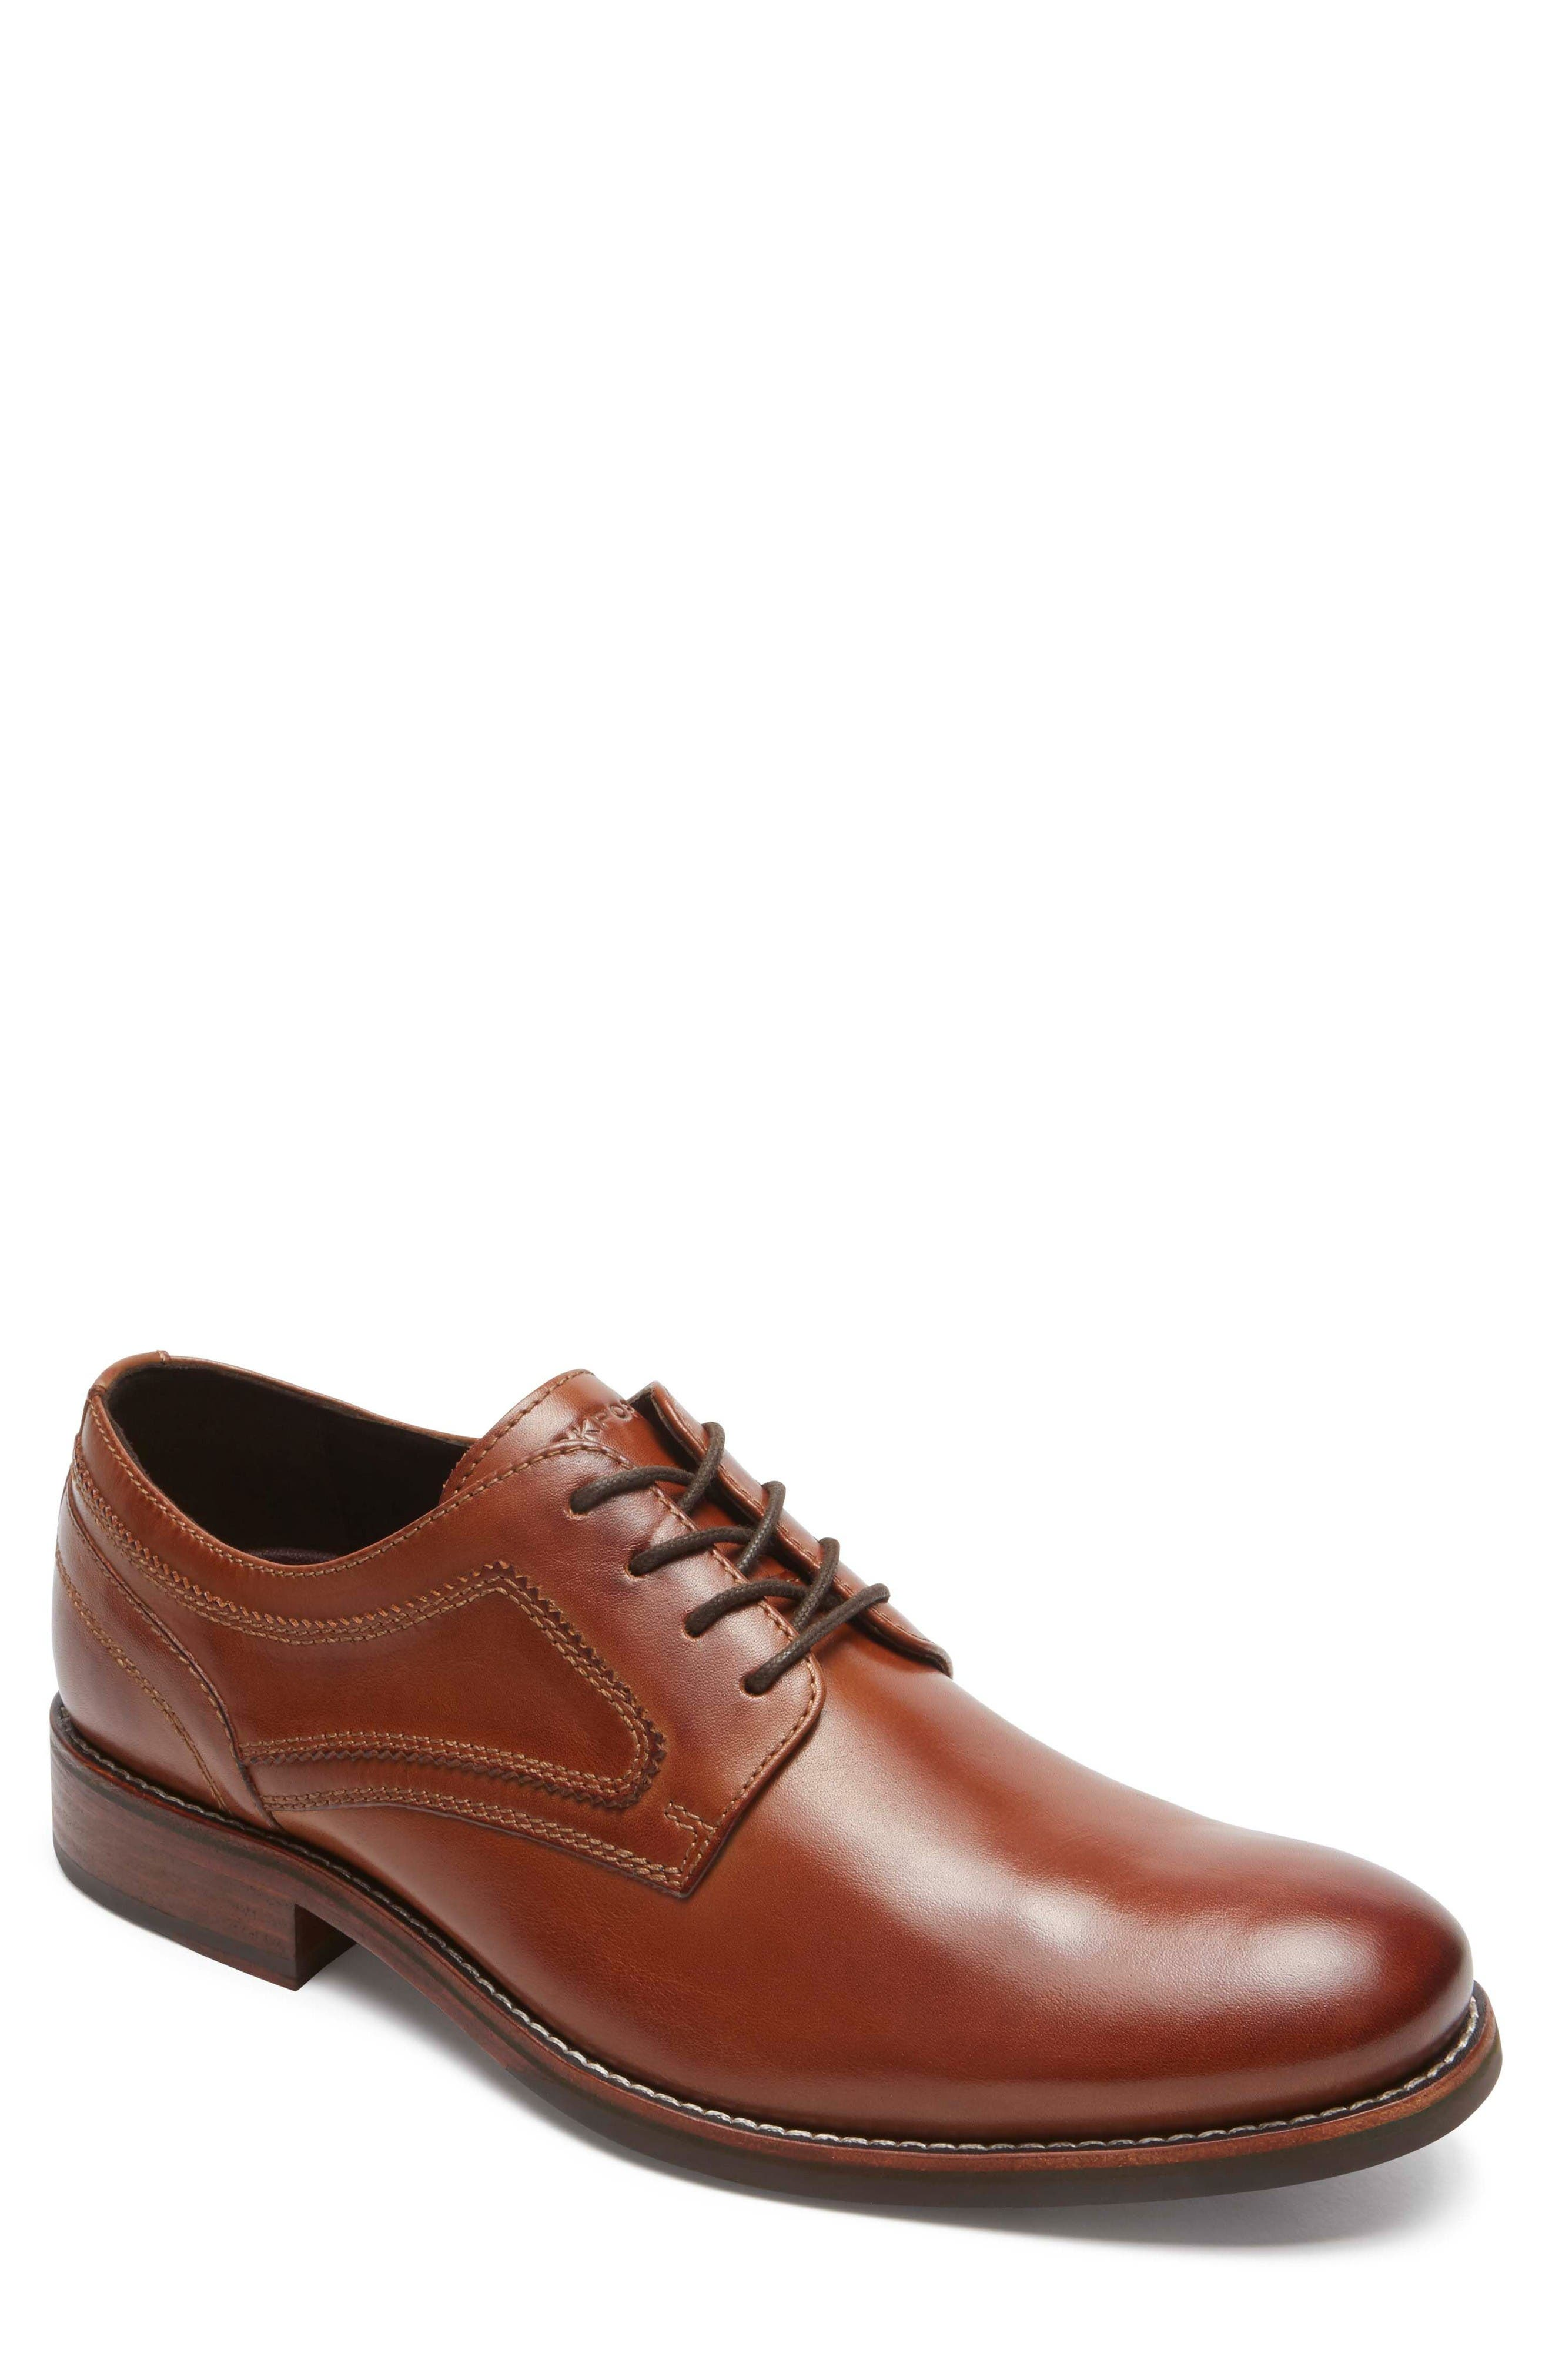 Rockport Wyat Plain Toe Derby (Men)